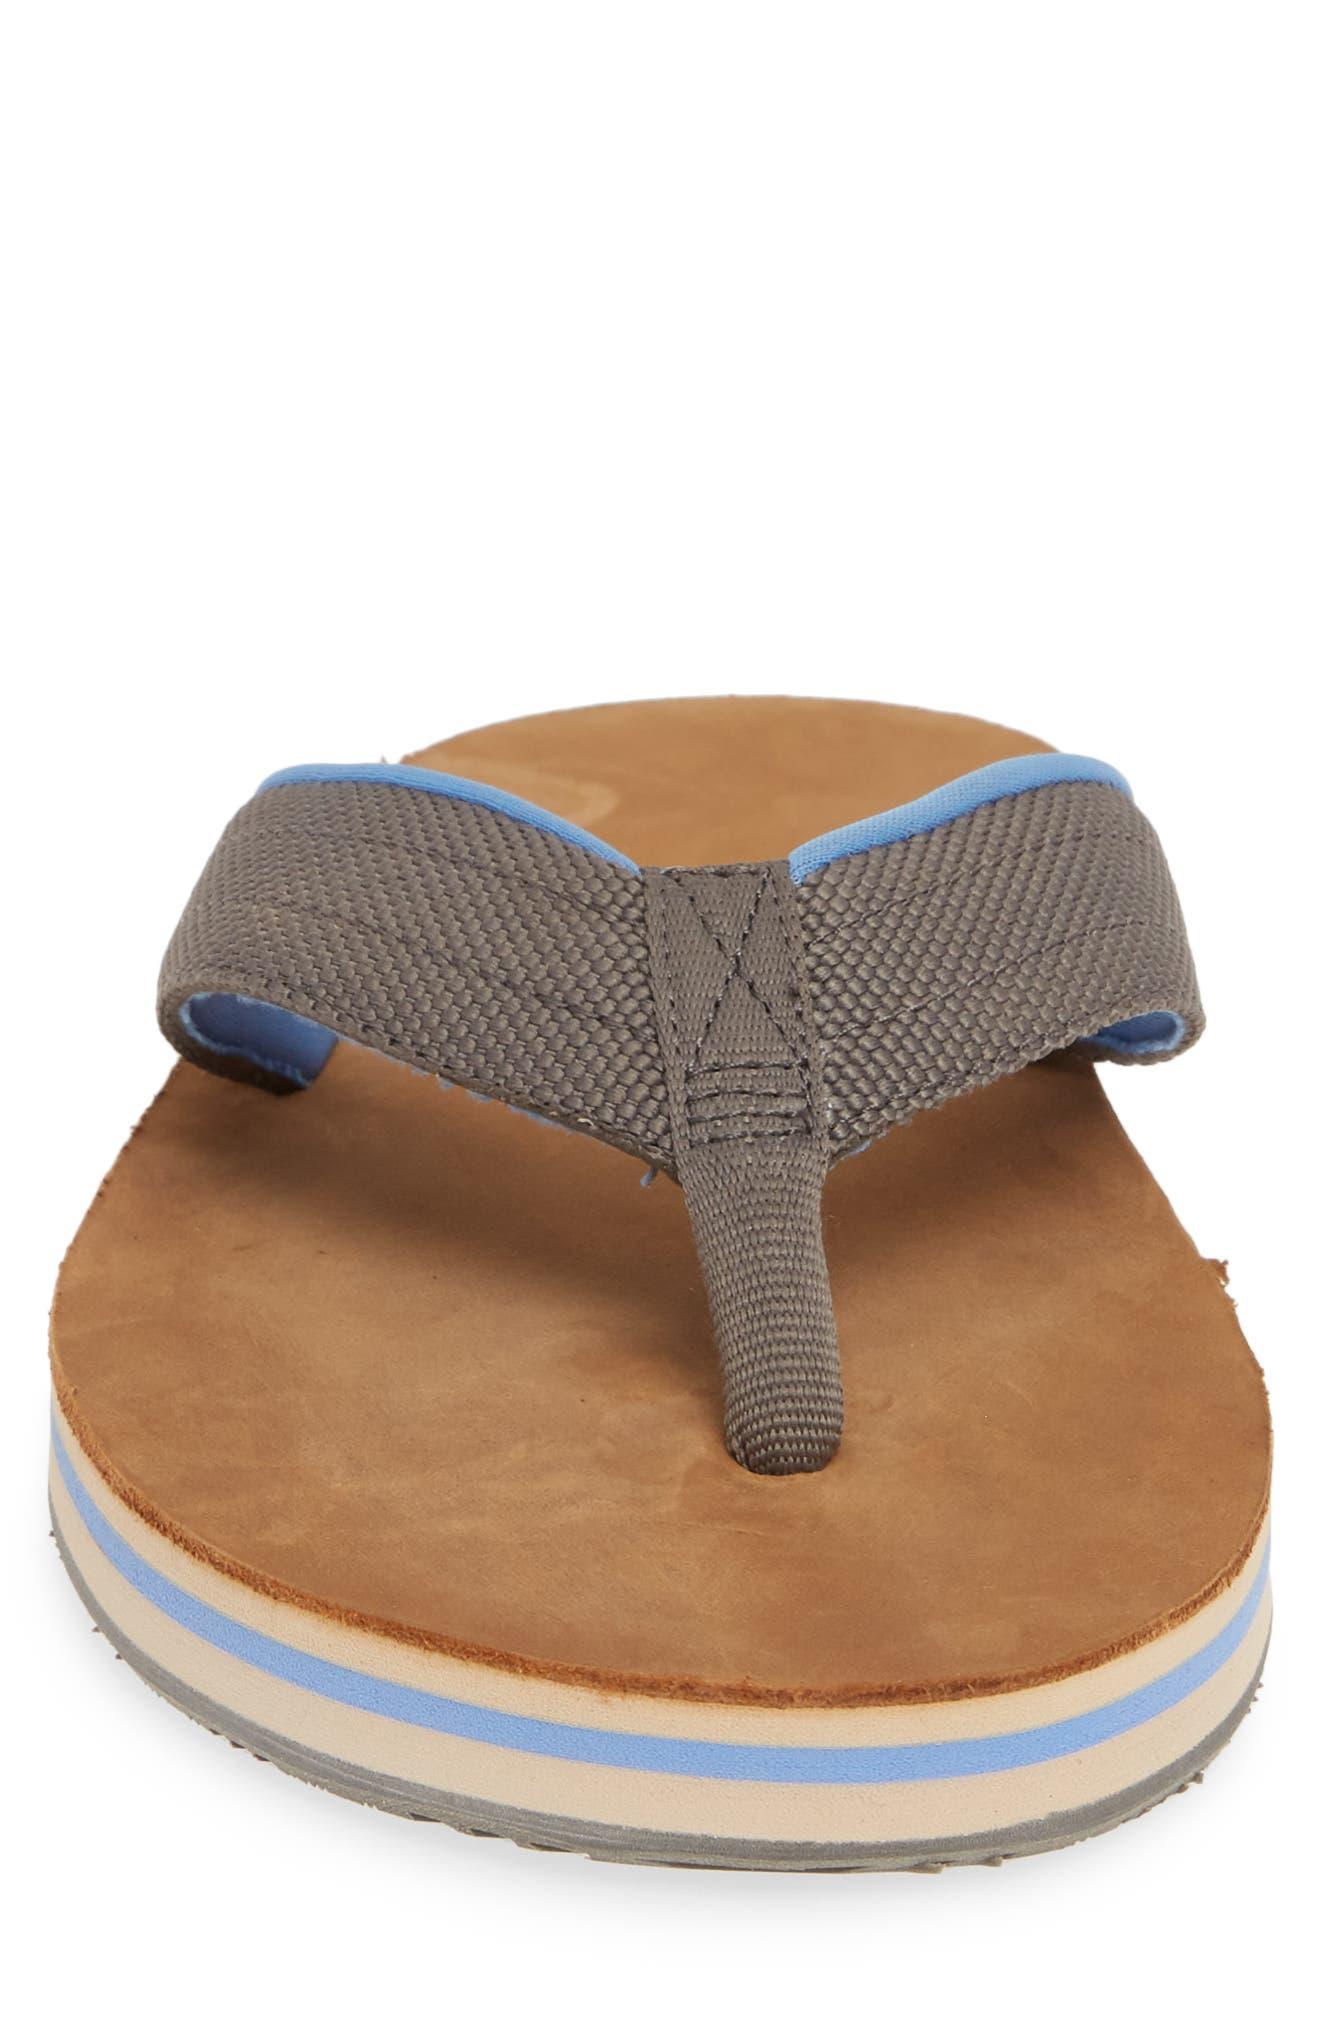 HARI MARI, 'Scouts' Flip Flop, Alternate thumbnail 4, color, GRAY/ BLUE